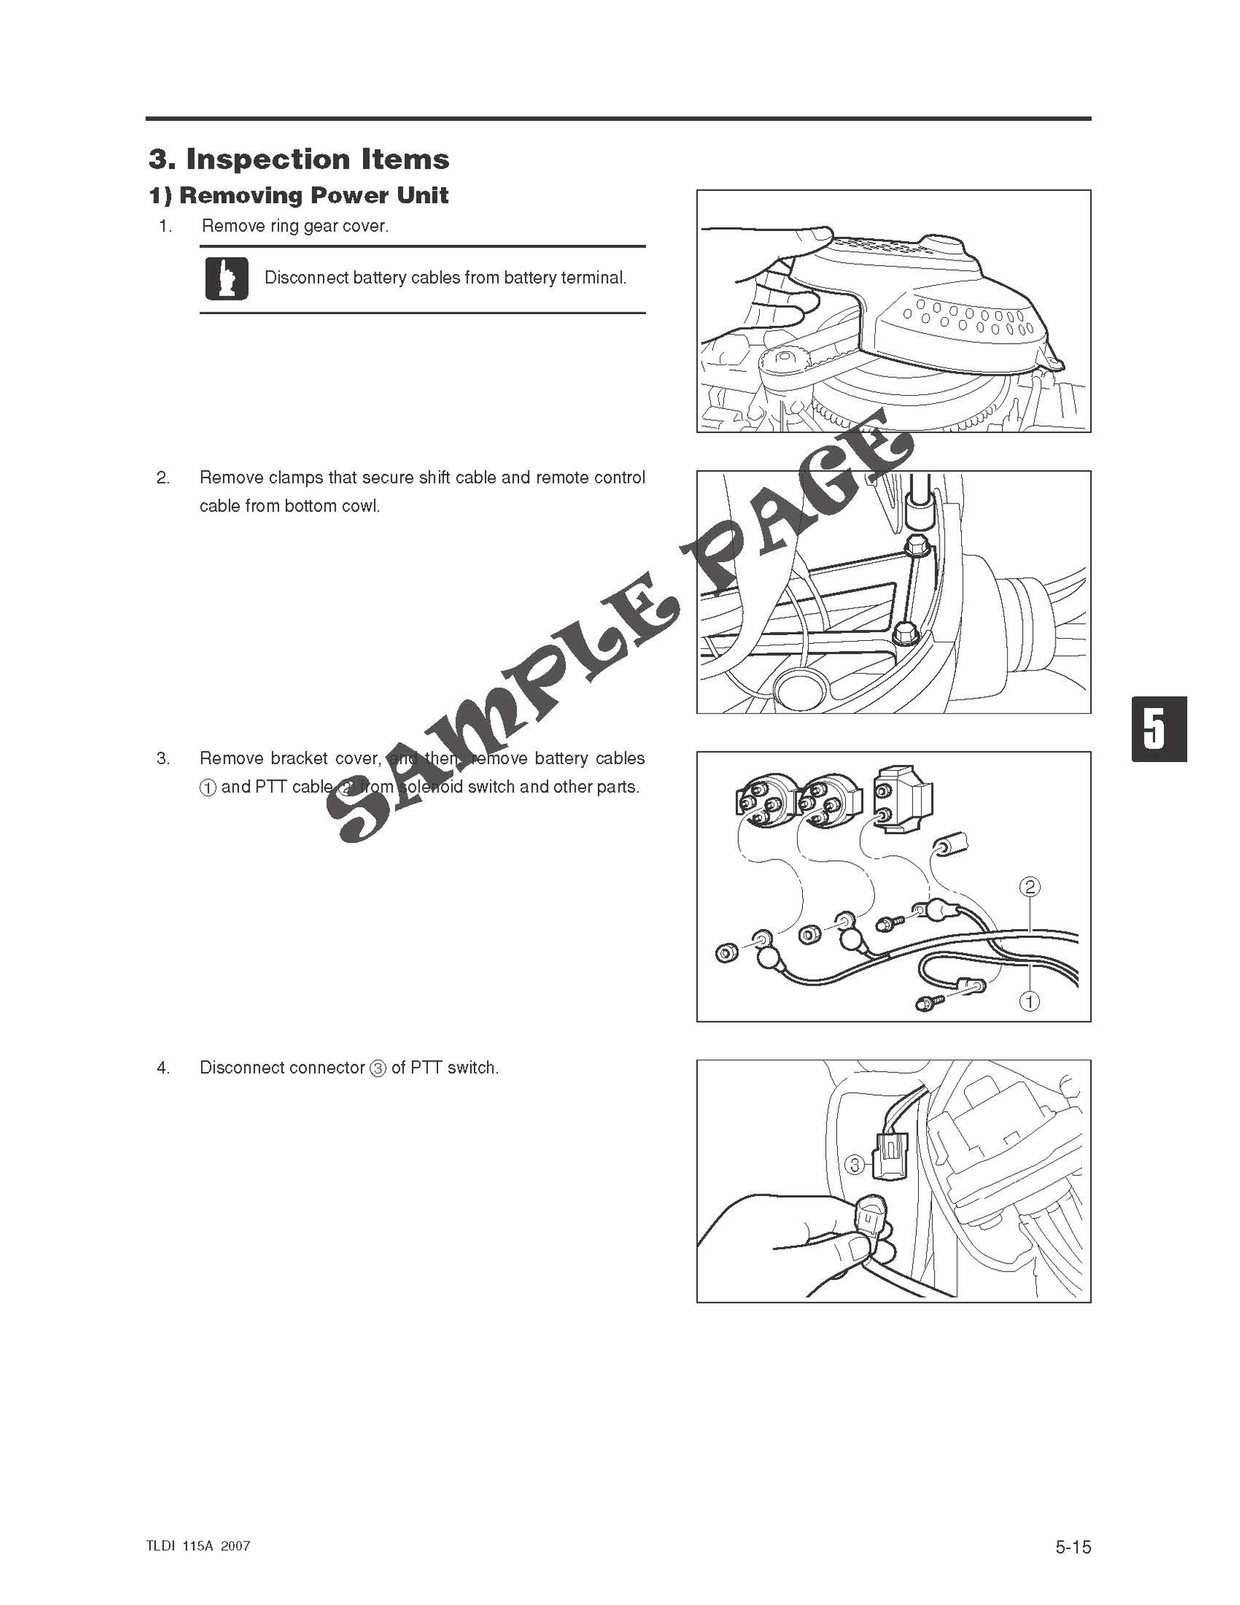 Tohatsu Repair Manual Tldi Pdf / Finally Bought My Motor